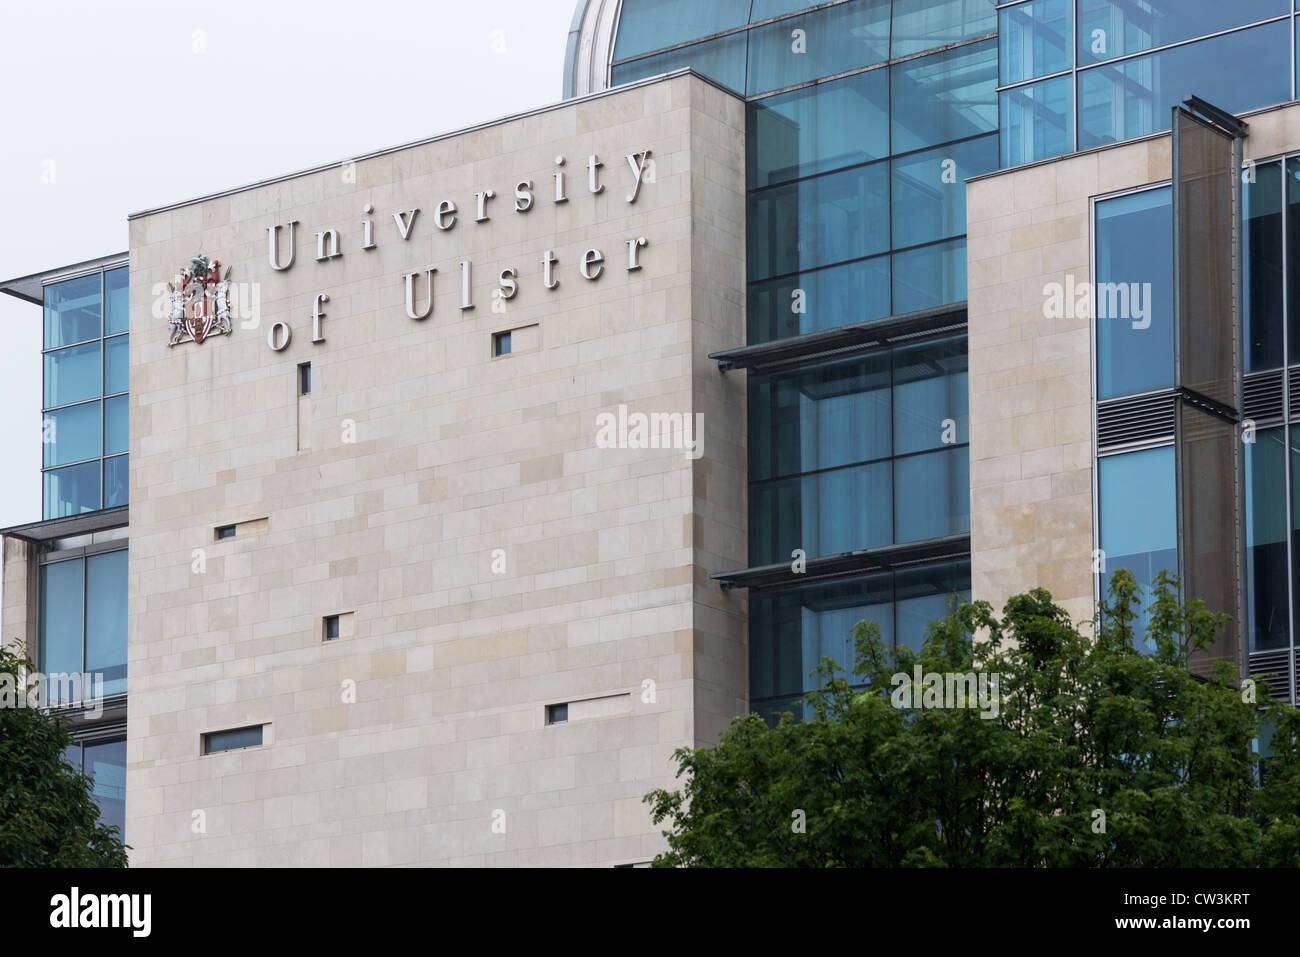 University of Ulster, Belfast, Ireland. - Stock Image